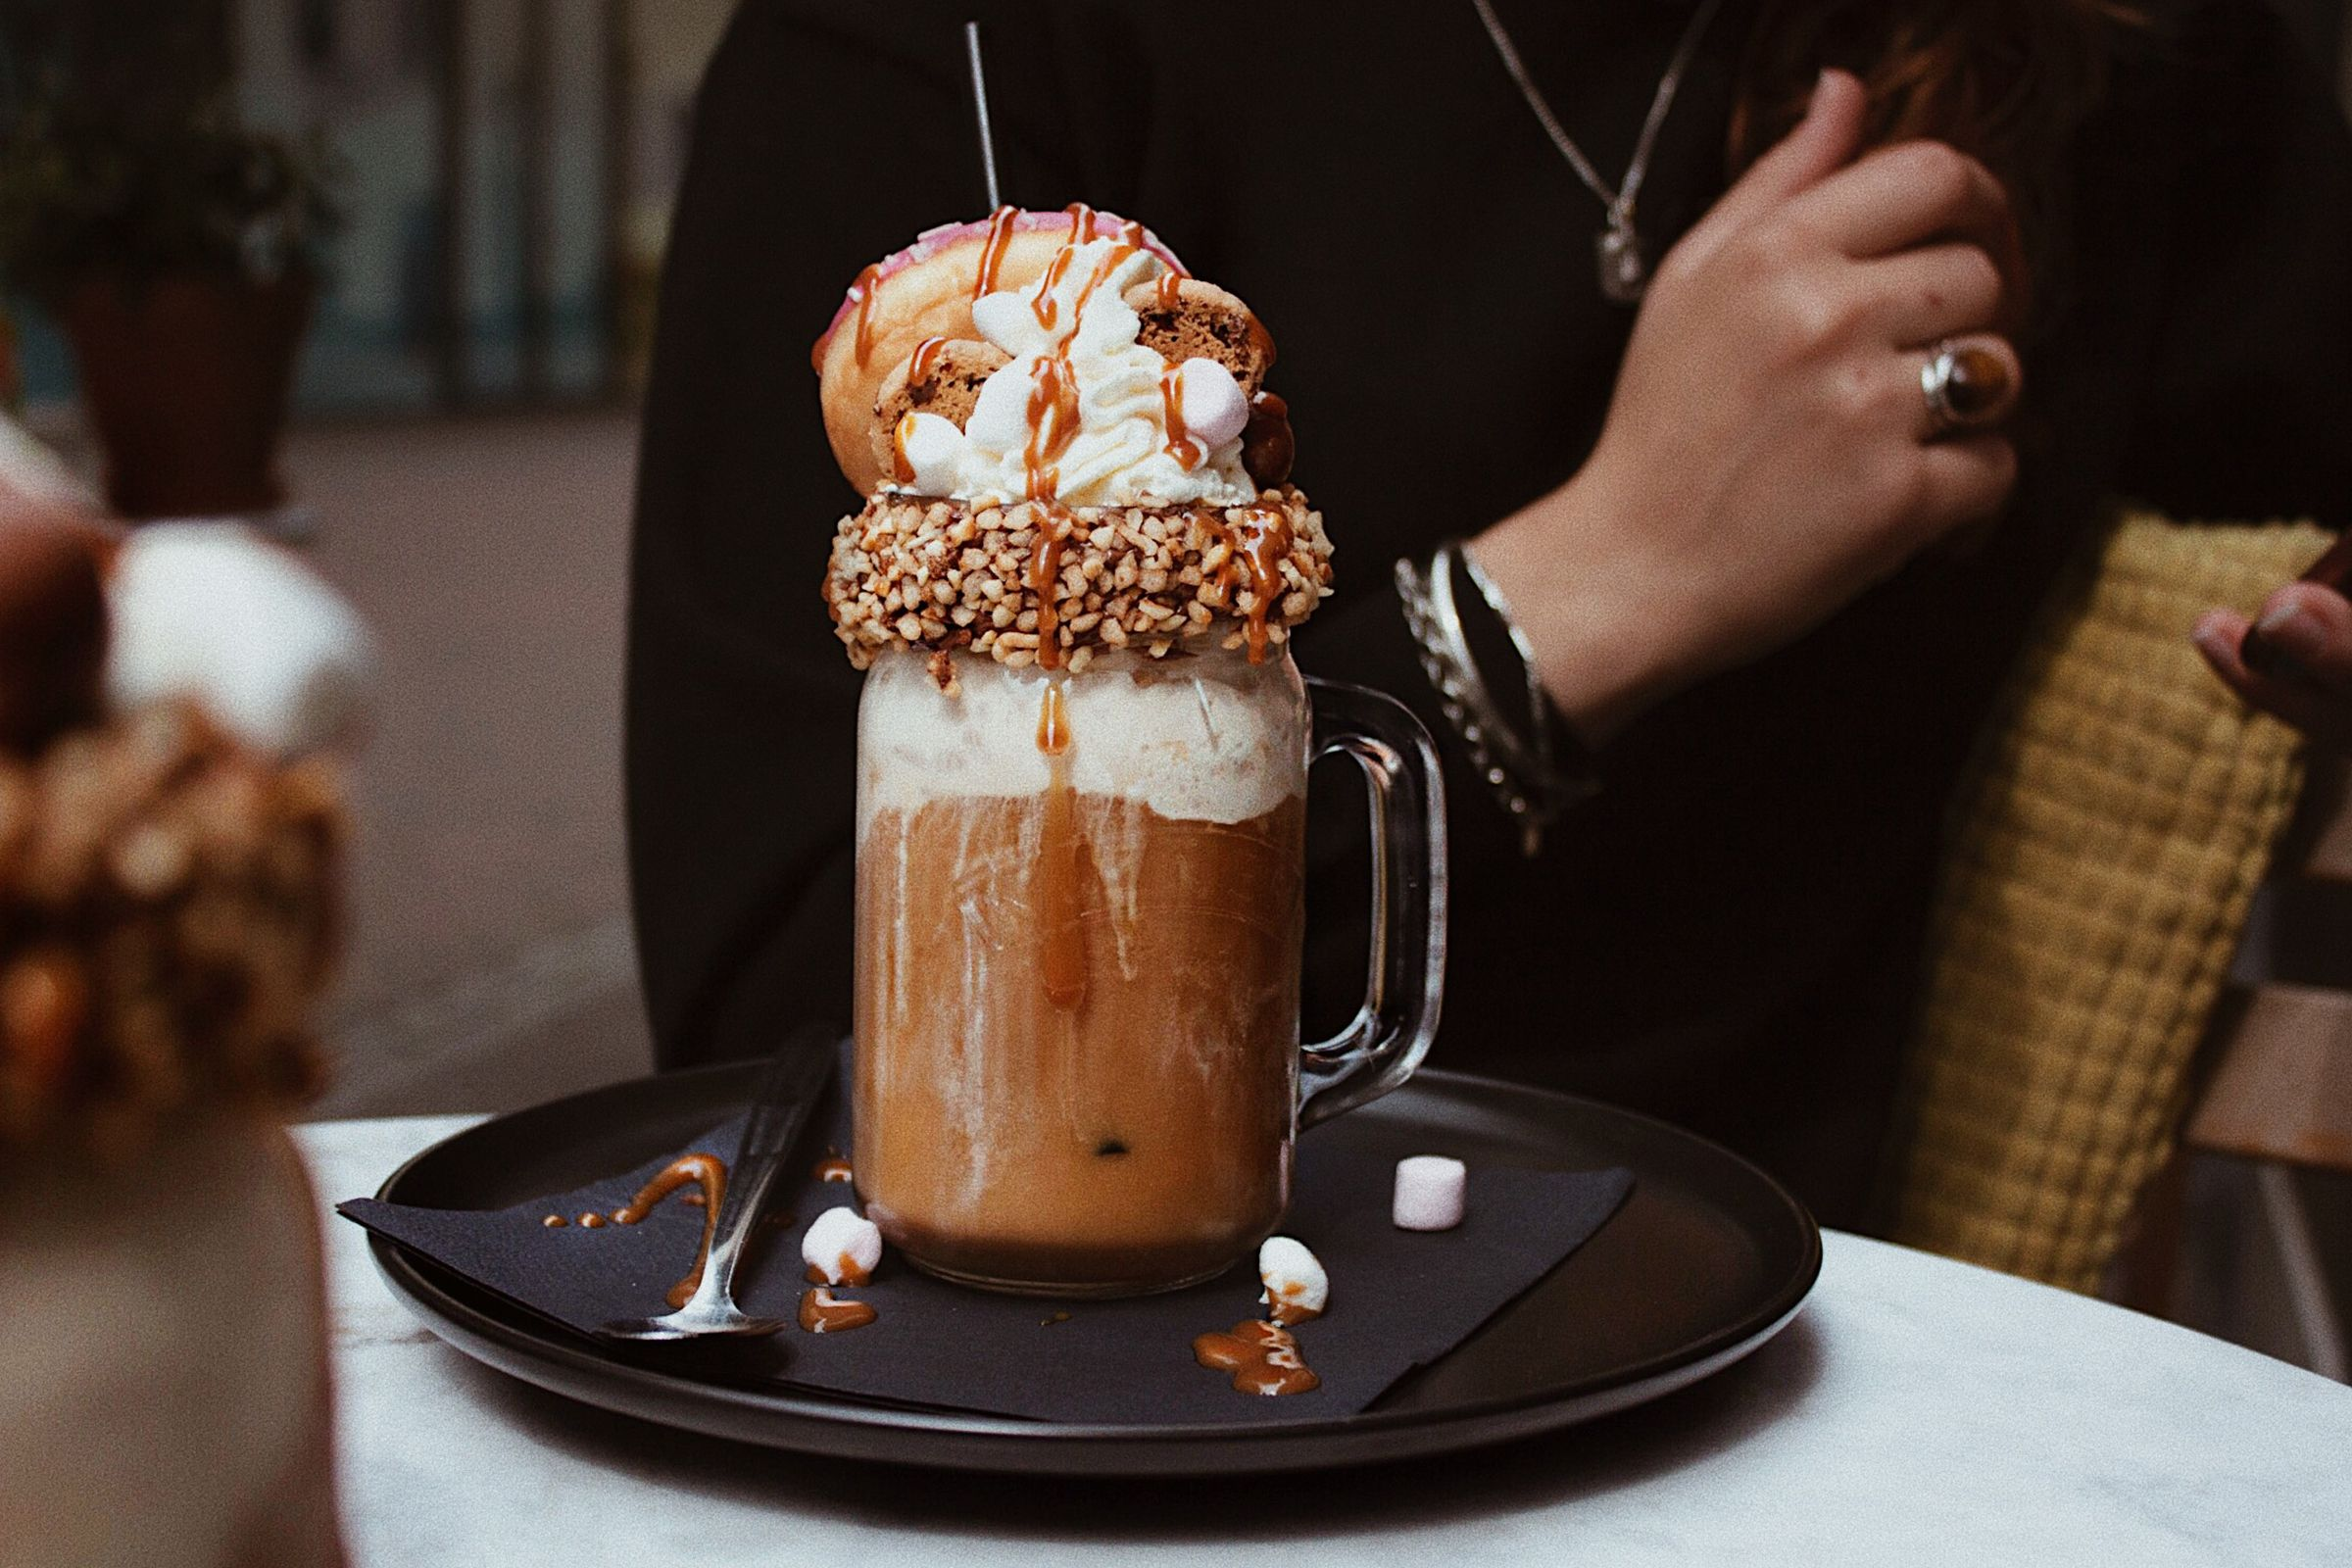 Book cafe Lewis Utrecht Lexpander foodporn #foodporn #food #foodtrend #IcedCoffee #milkshake #Donut #madness #utrecht